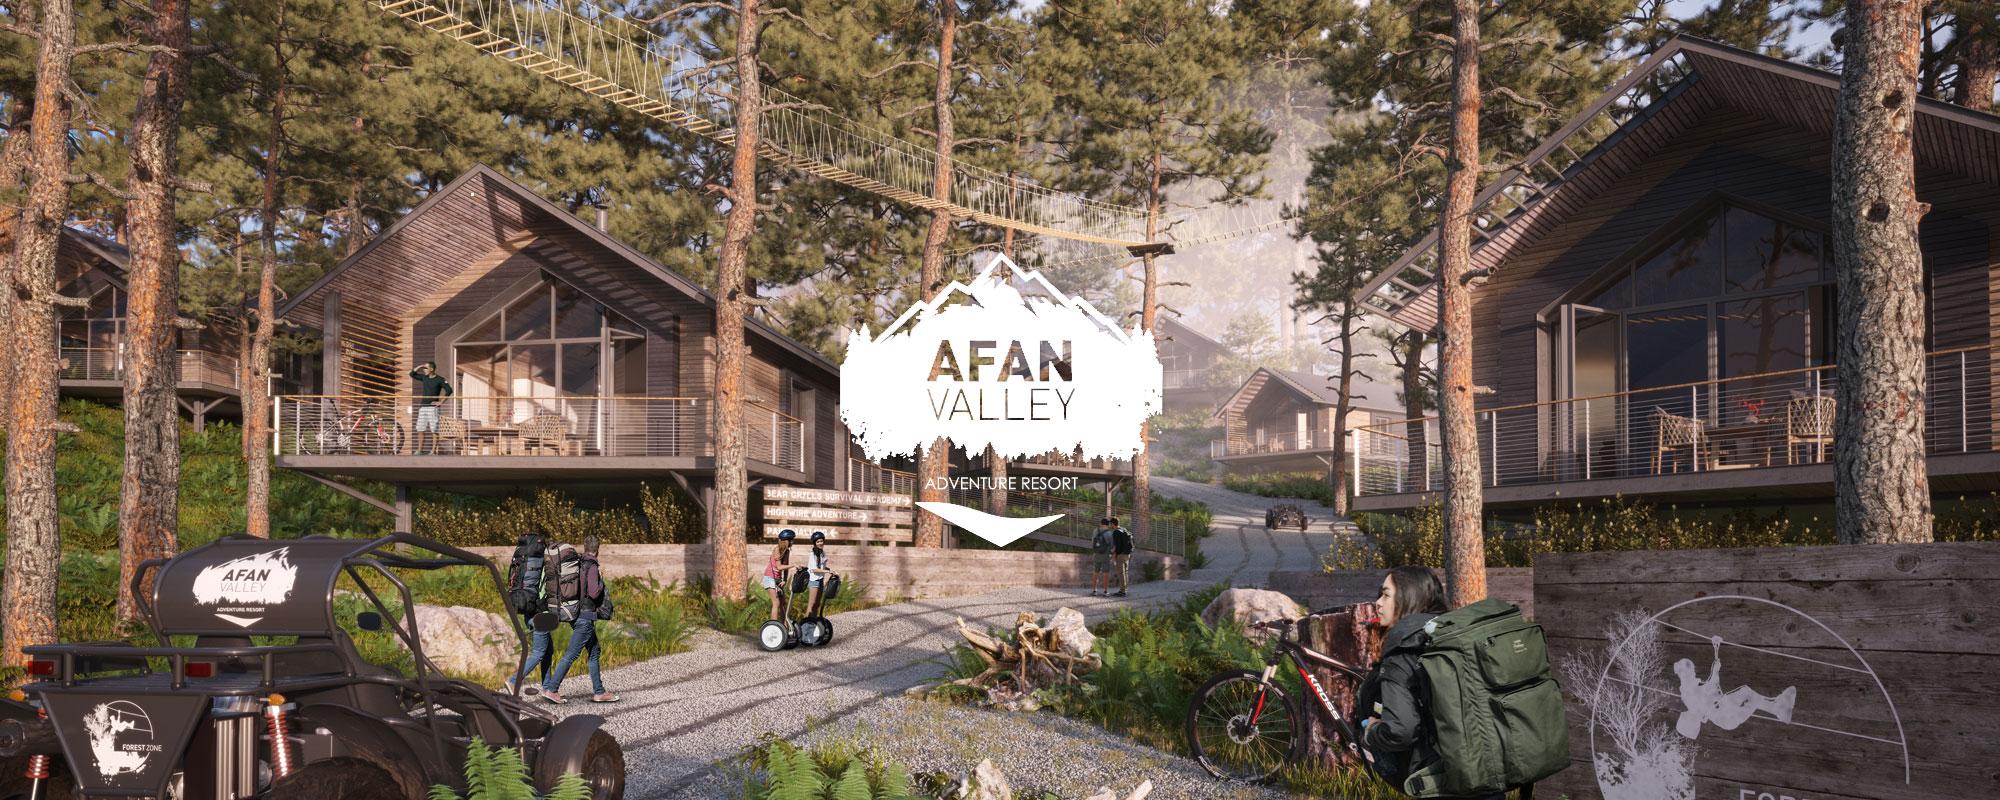 Afan Valley Adventure Resort Forest Zone